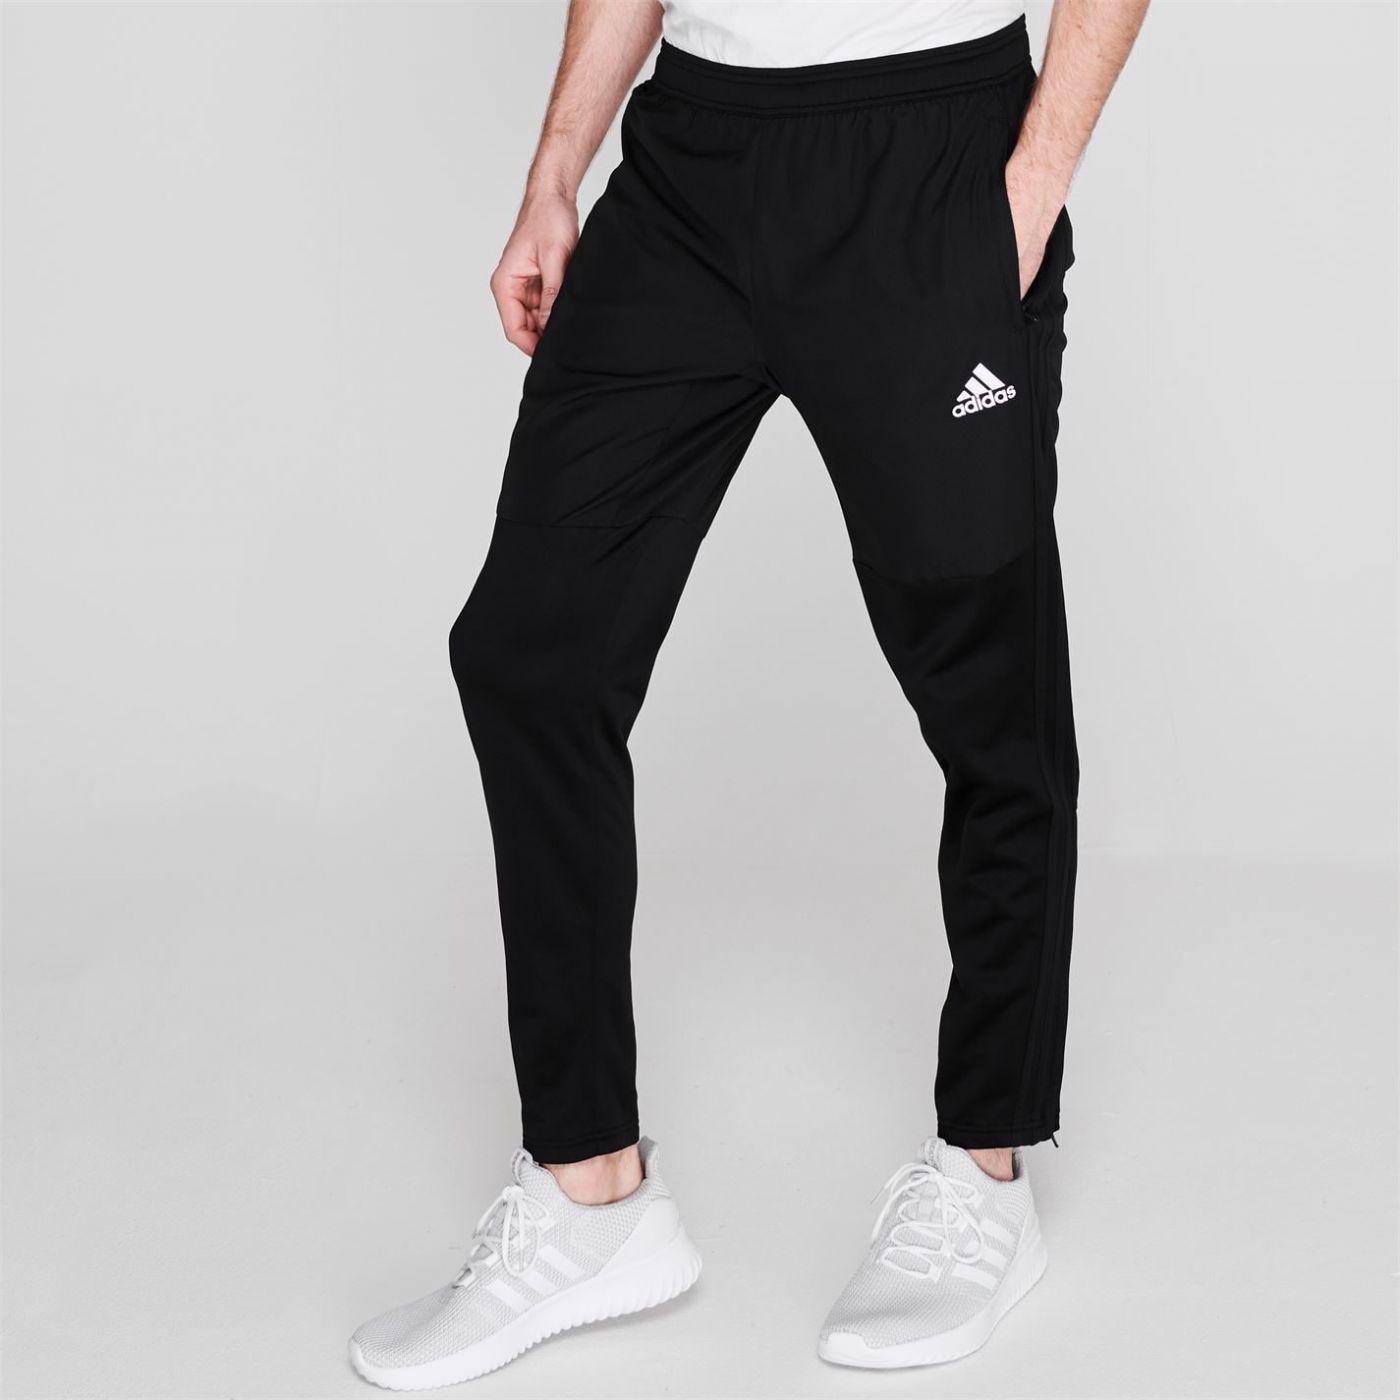 Adidas Performance Tracksuit Bottoms Mens